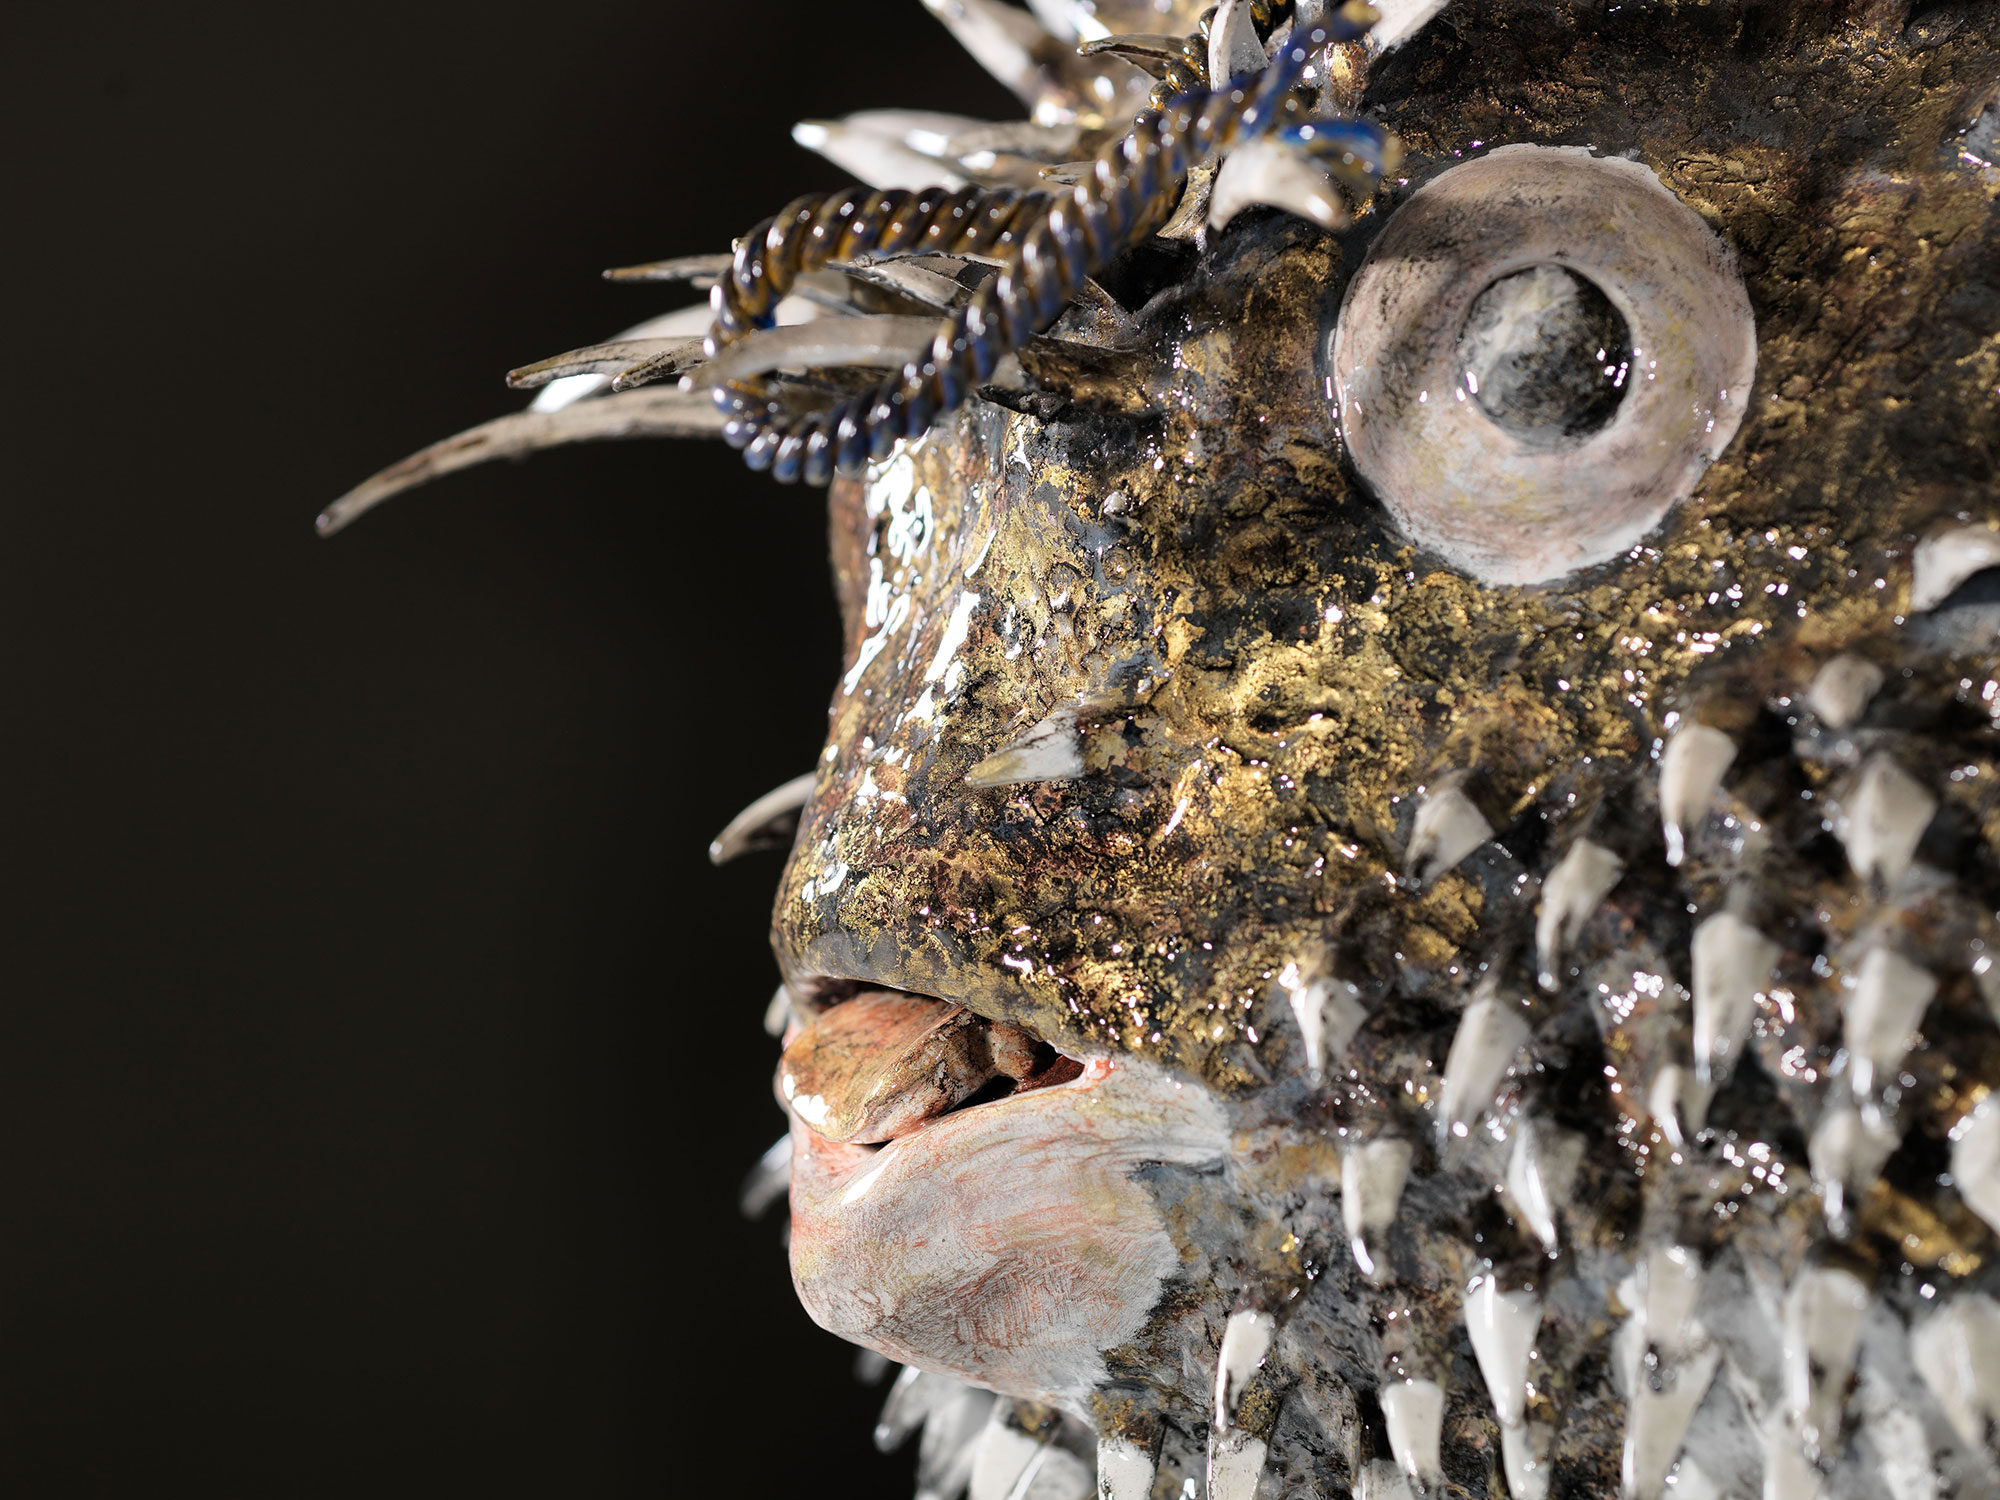 Isaia Zilli - Blowfish Face Detail